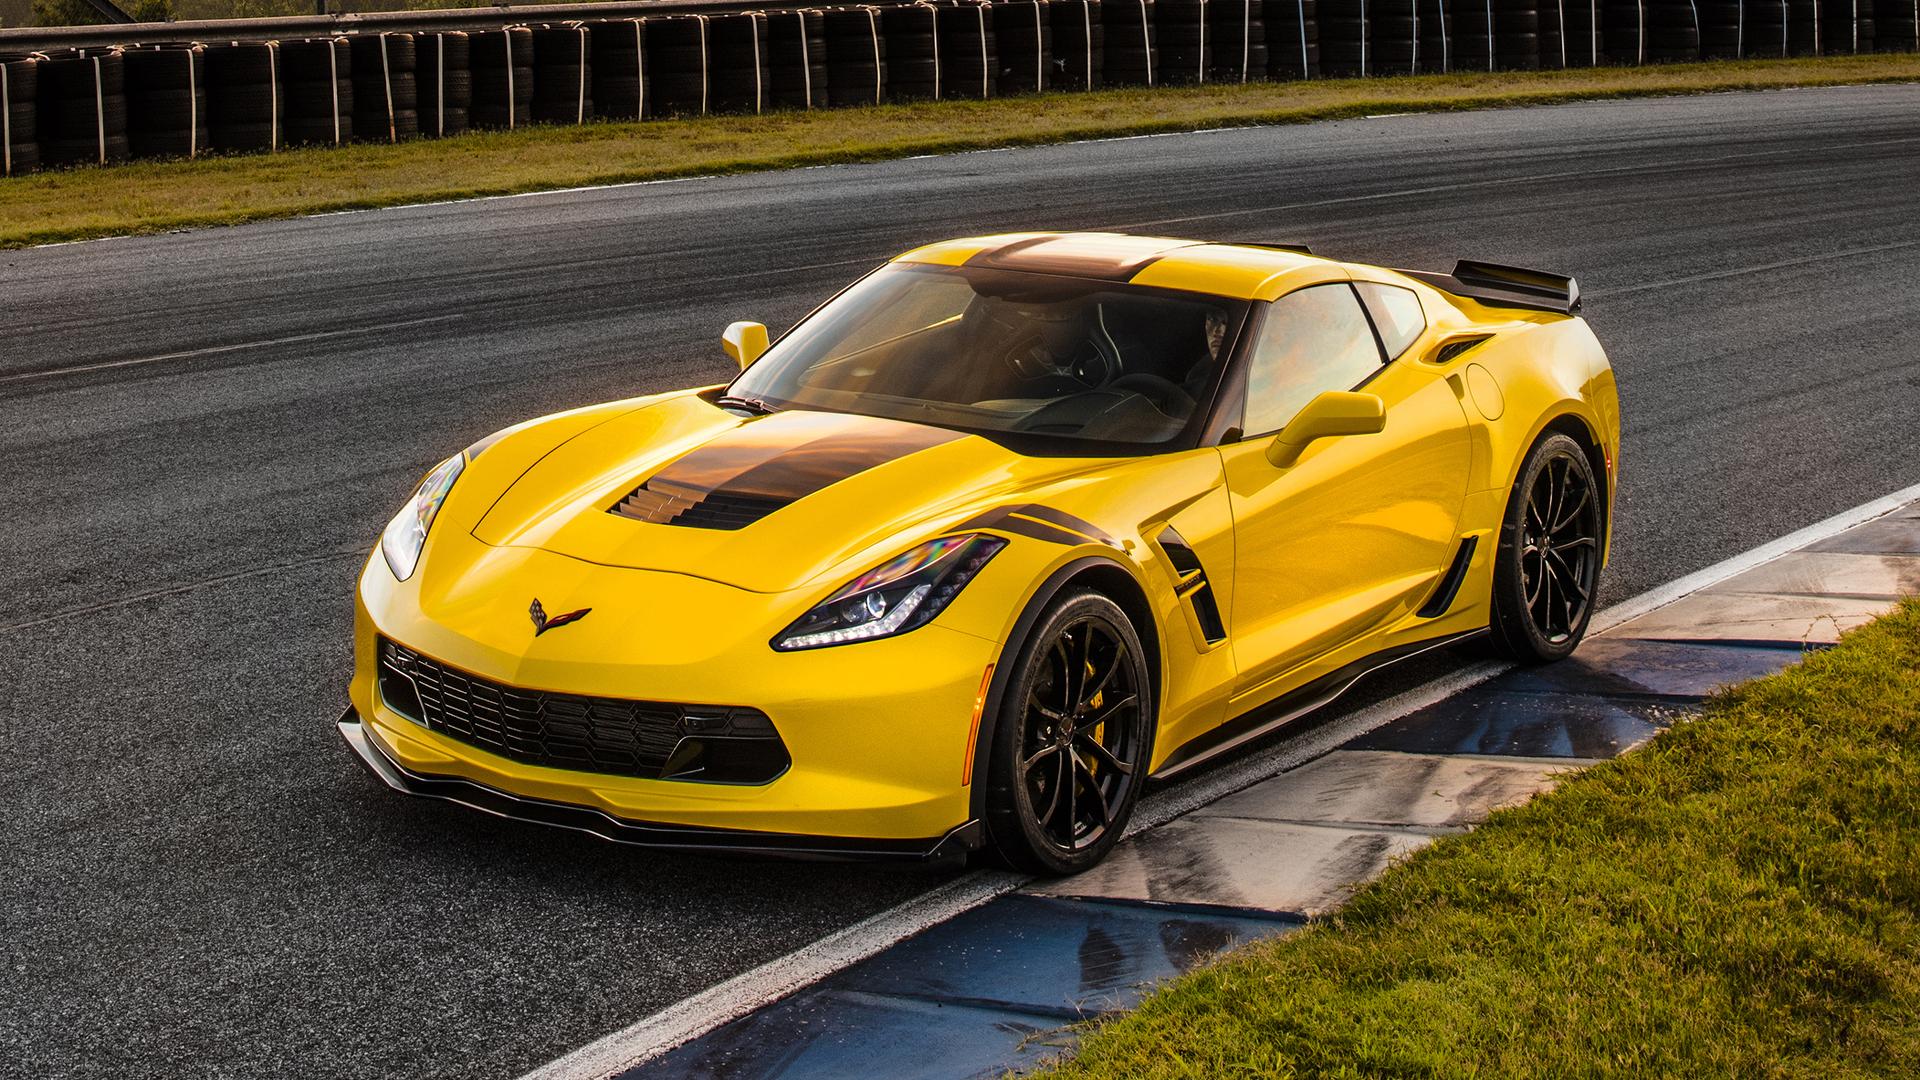 2017 Chevy Corvette Stingray >> First Drive: 2017 Chevy Corvette Grand Sport